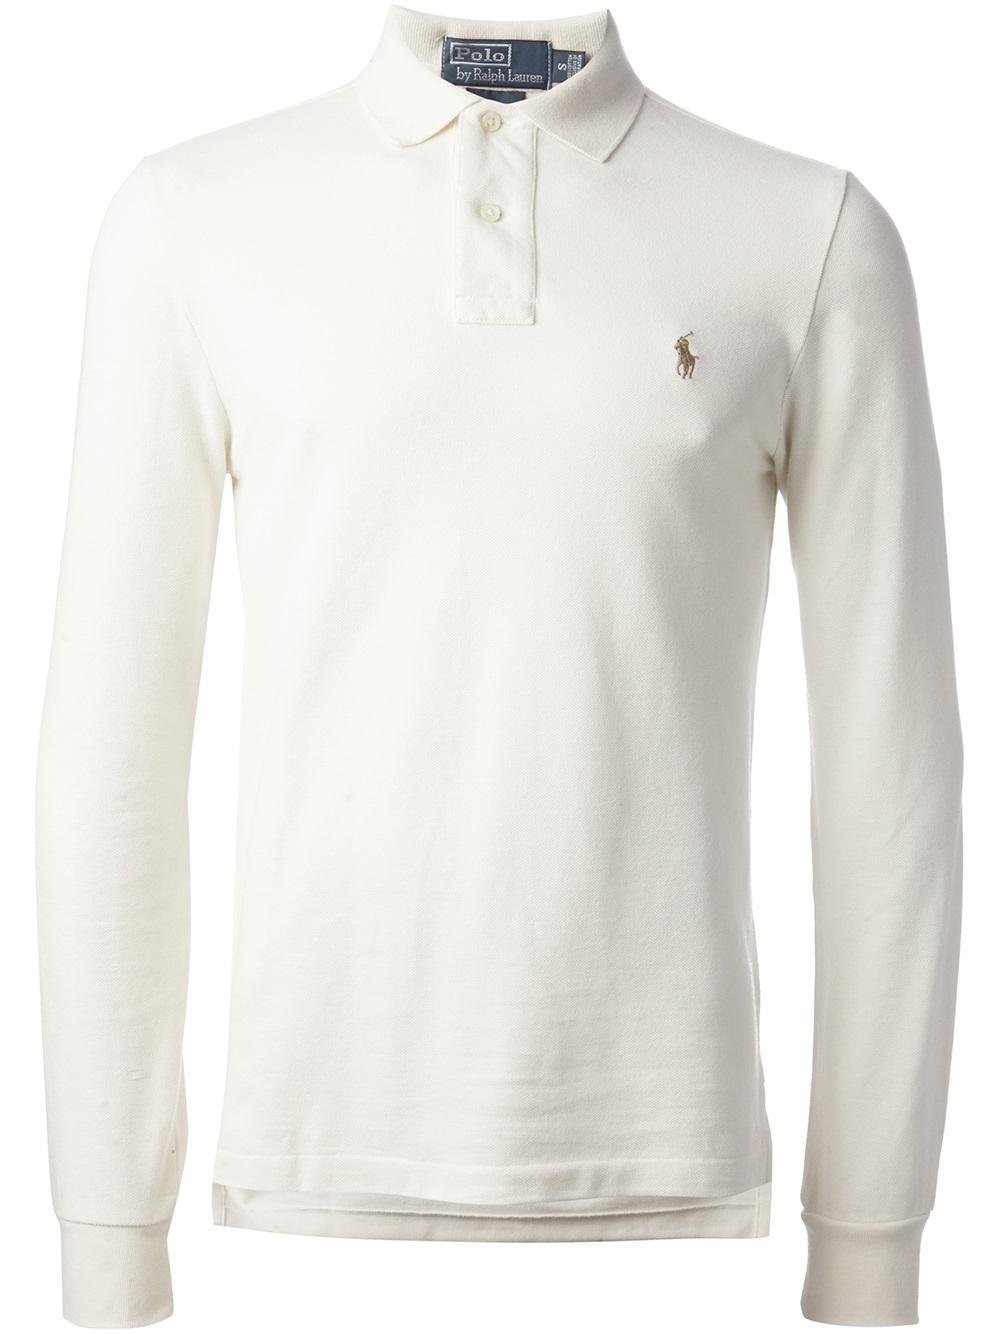 white long sleeve ralph lauren polo shirt